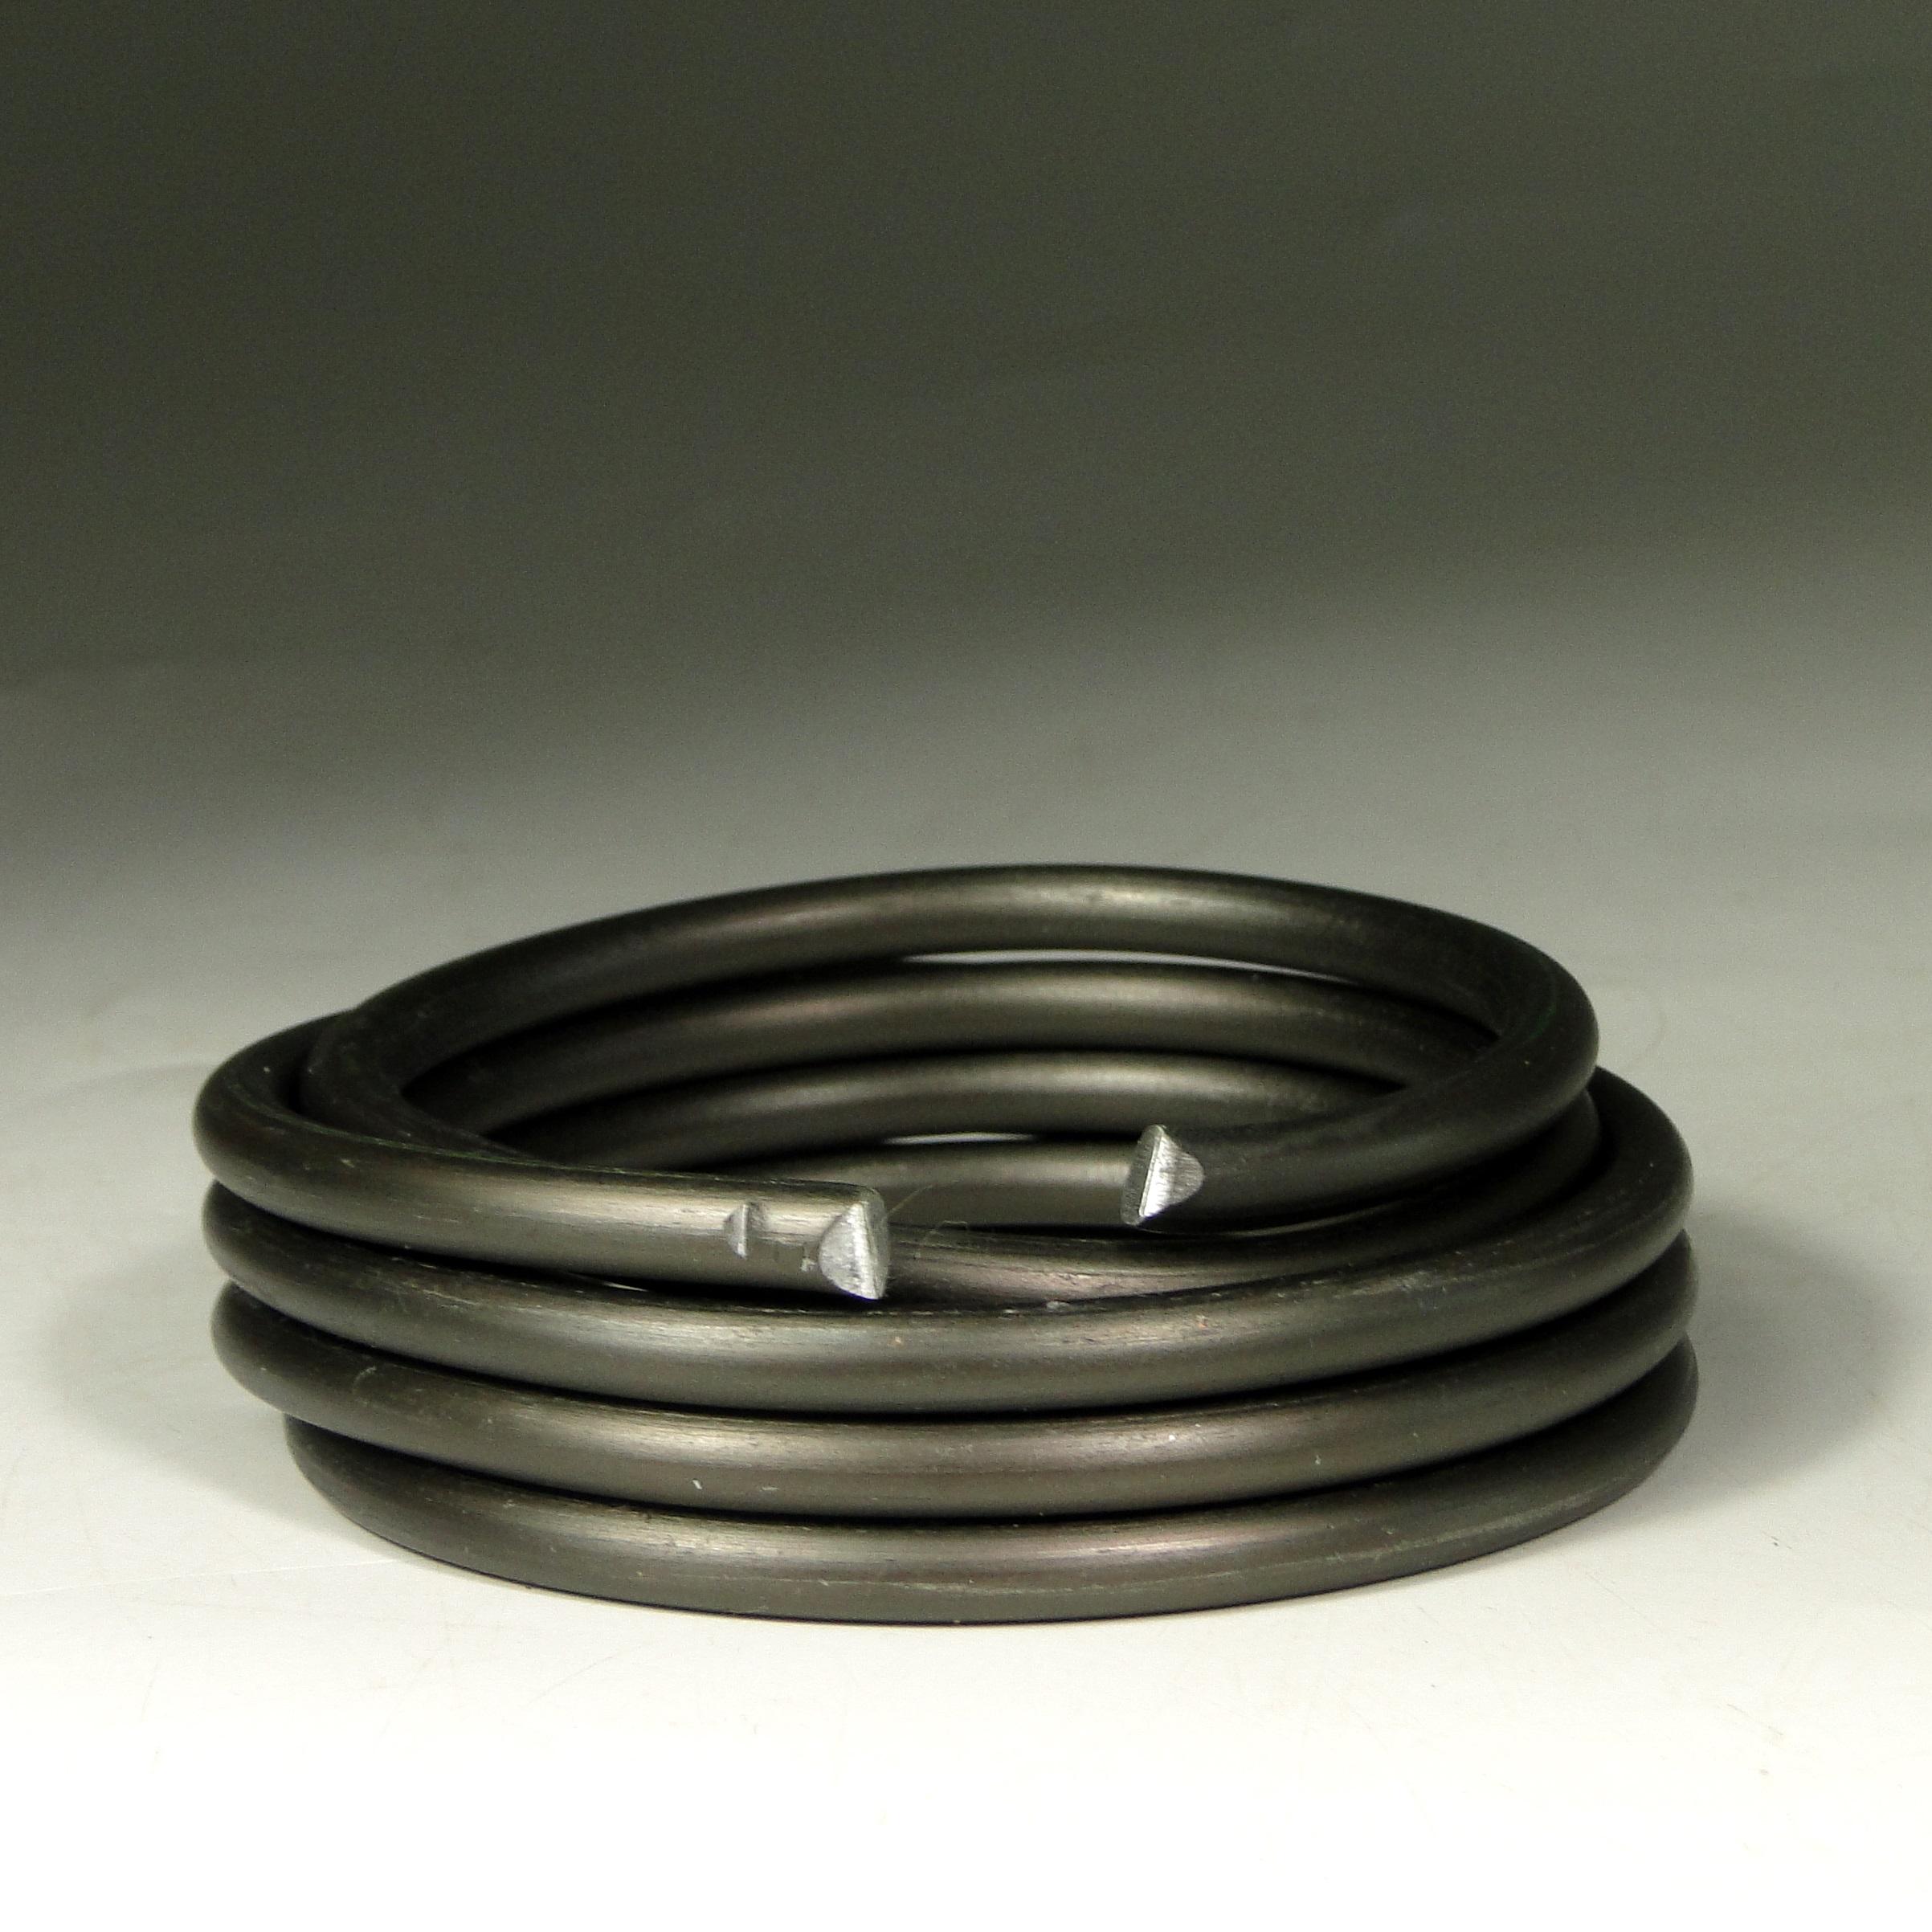 Проволока для бонсай 5,0 мм